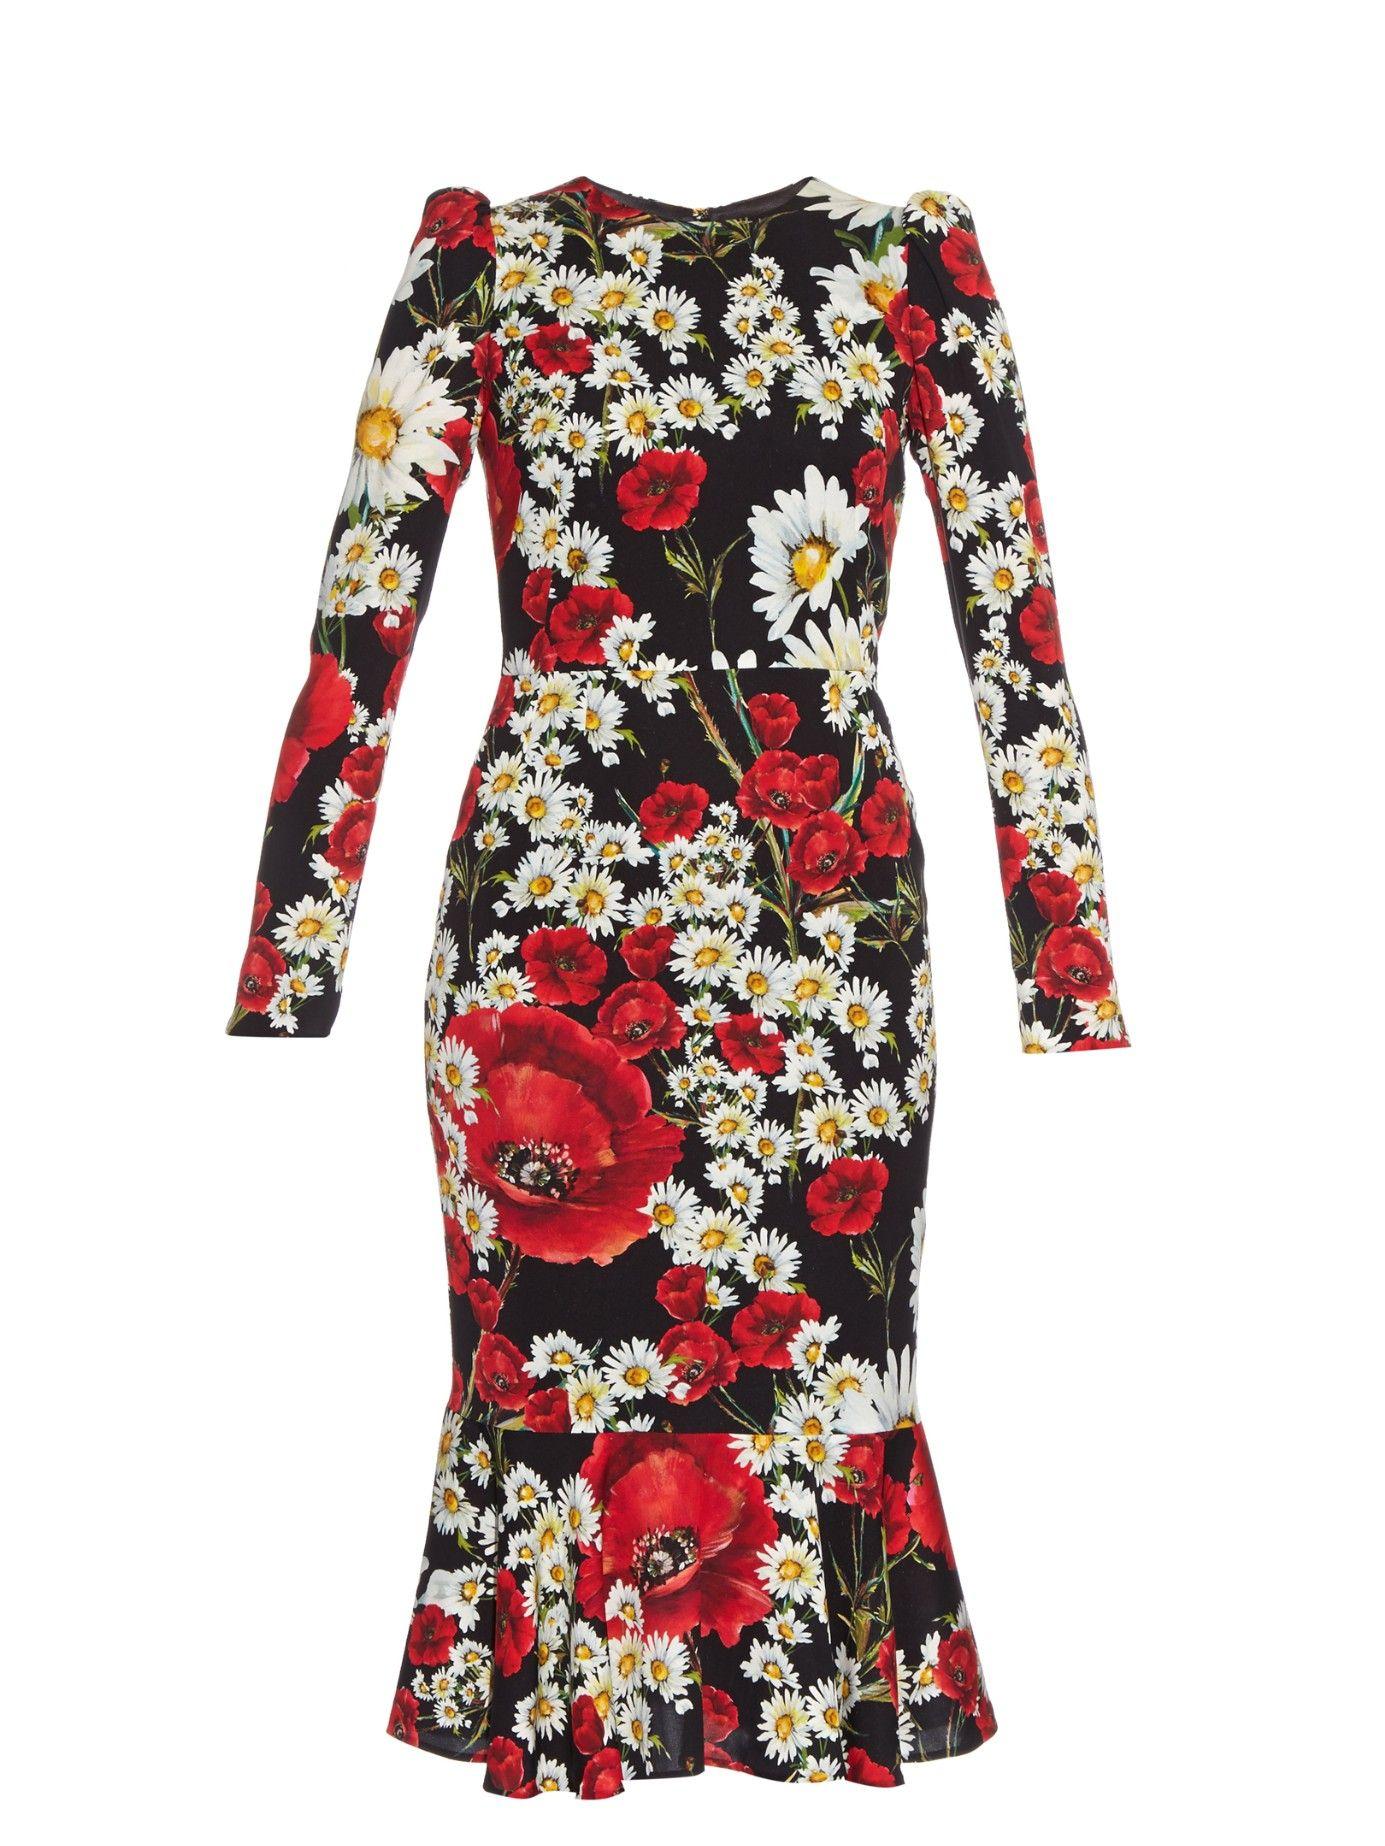 Poppy and daisy-print dress | Dolce & Gabbana | MATCHESFASHION.COM